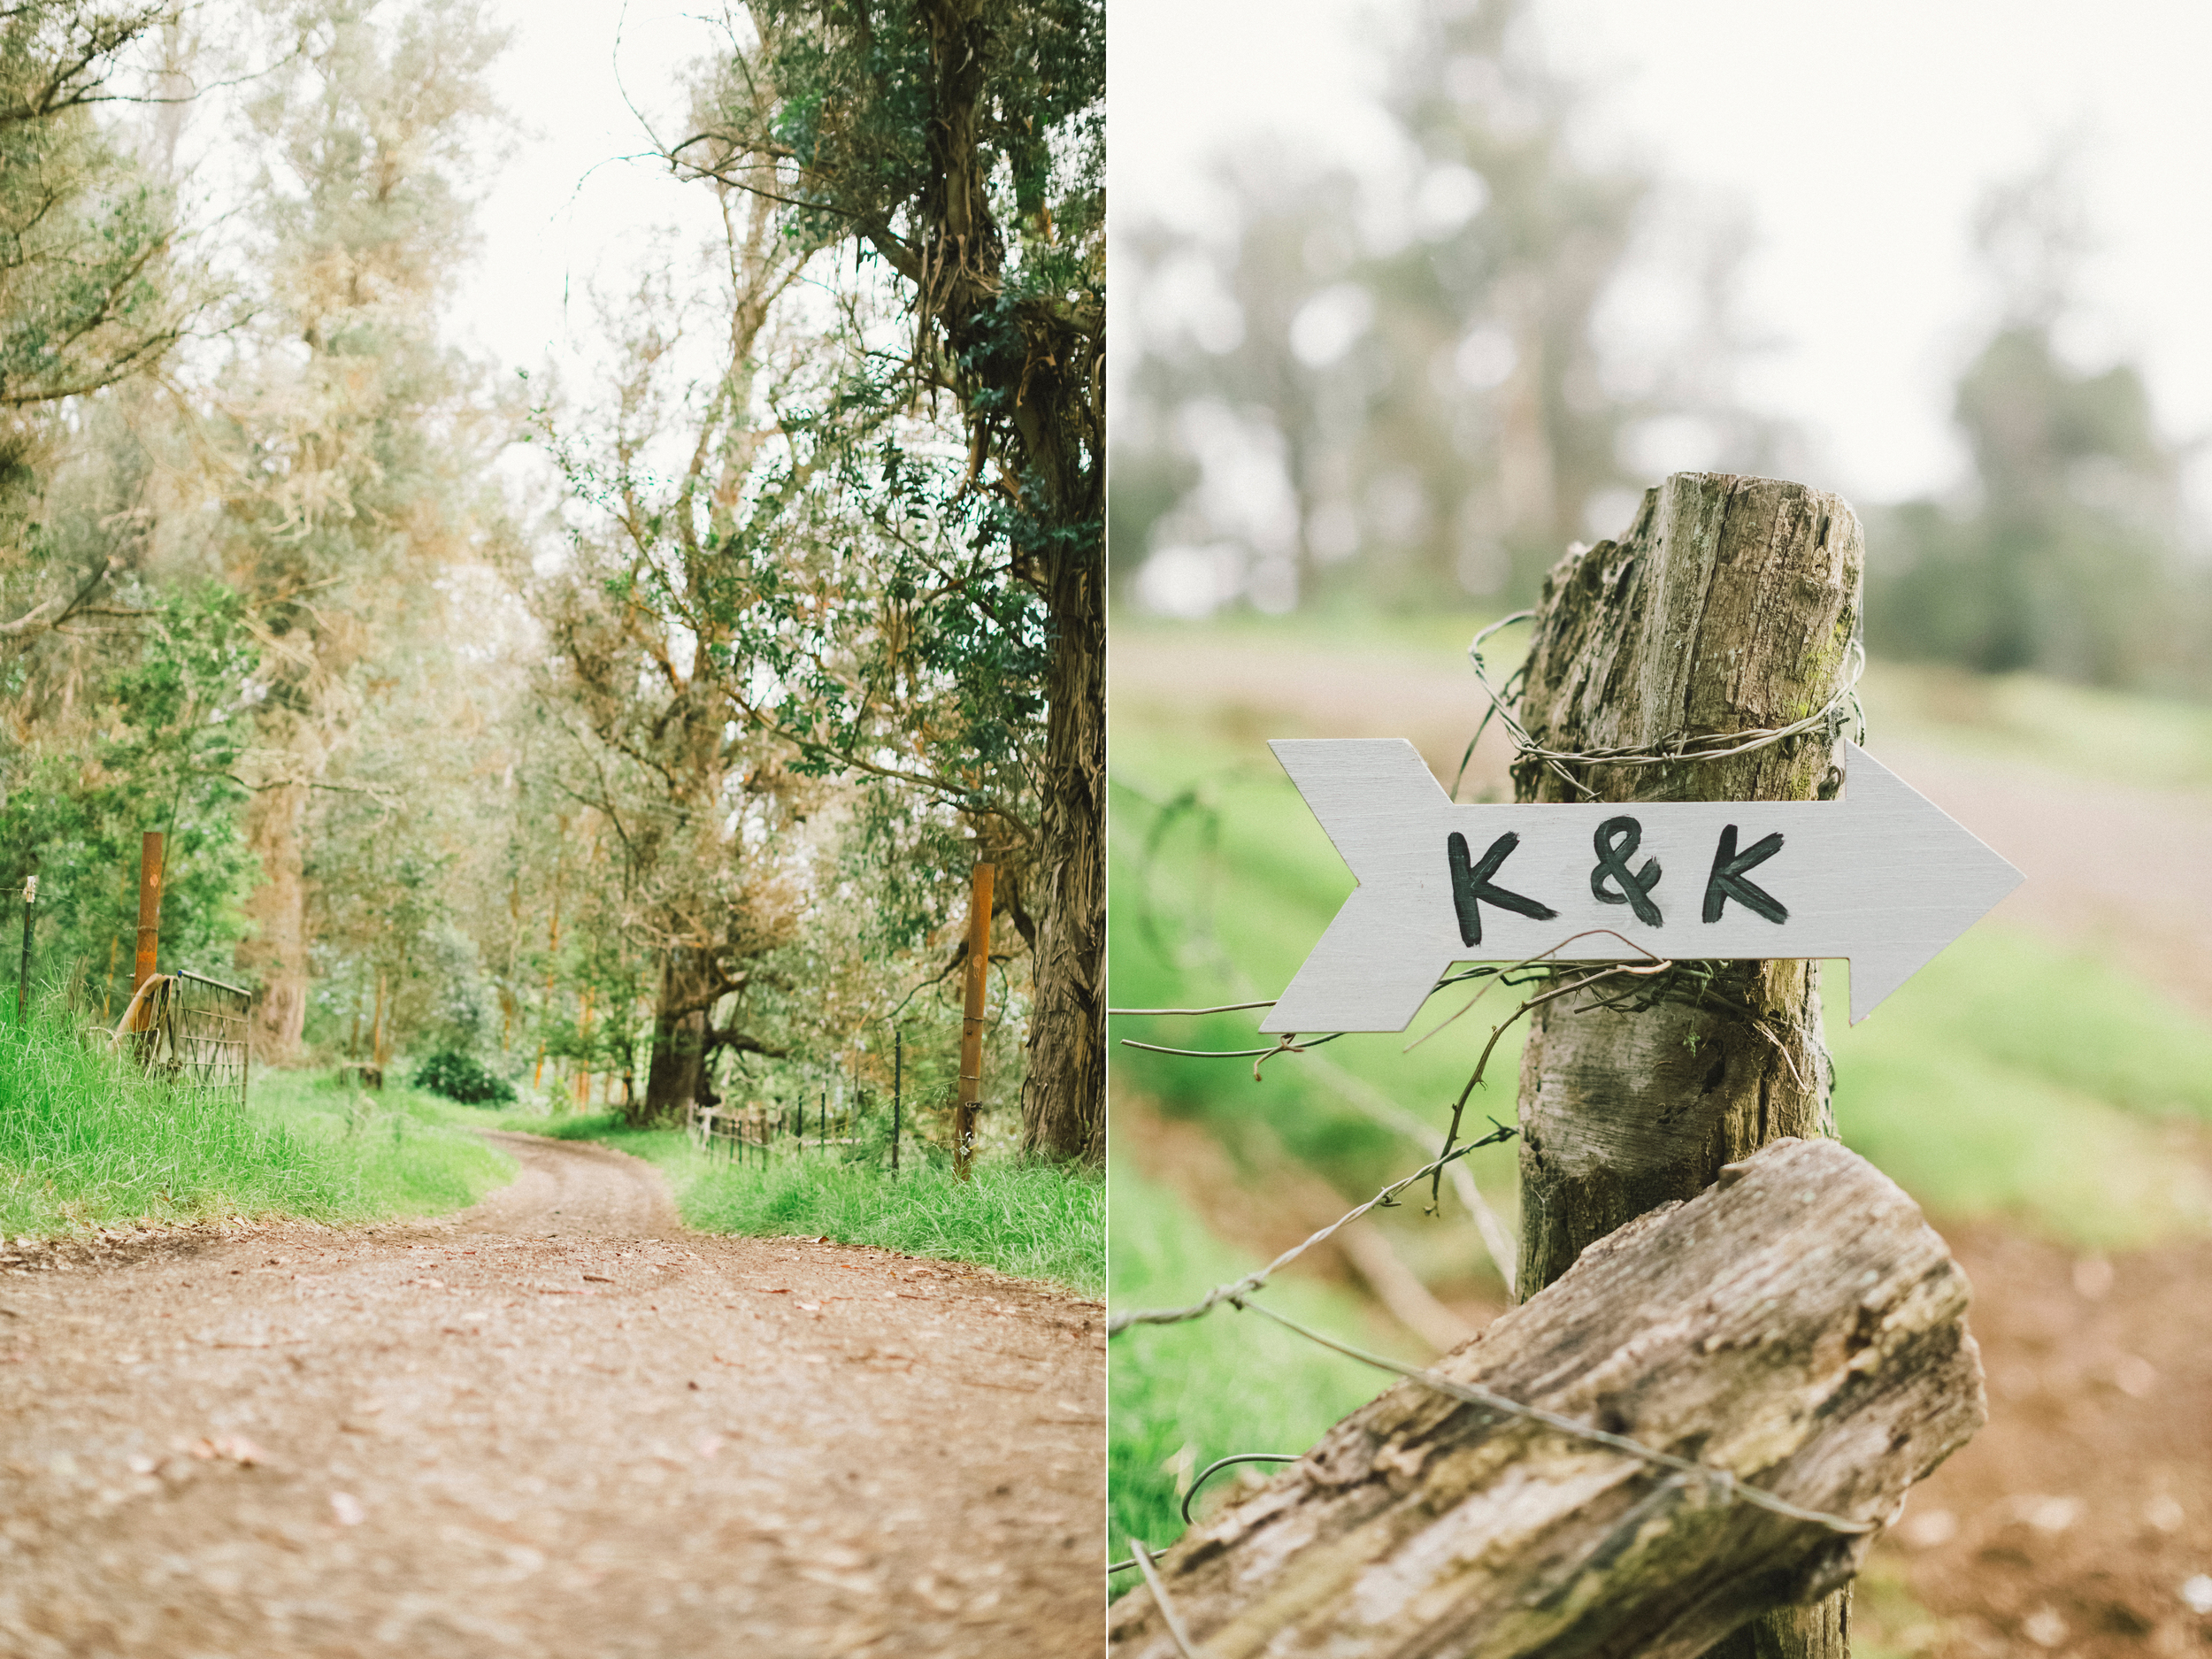 angie-diaz-photography-maui-wedding-6 copy.jpg